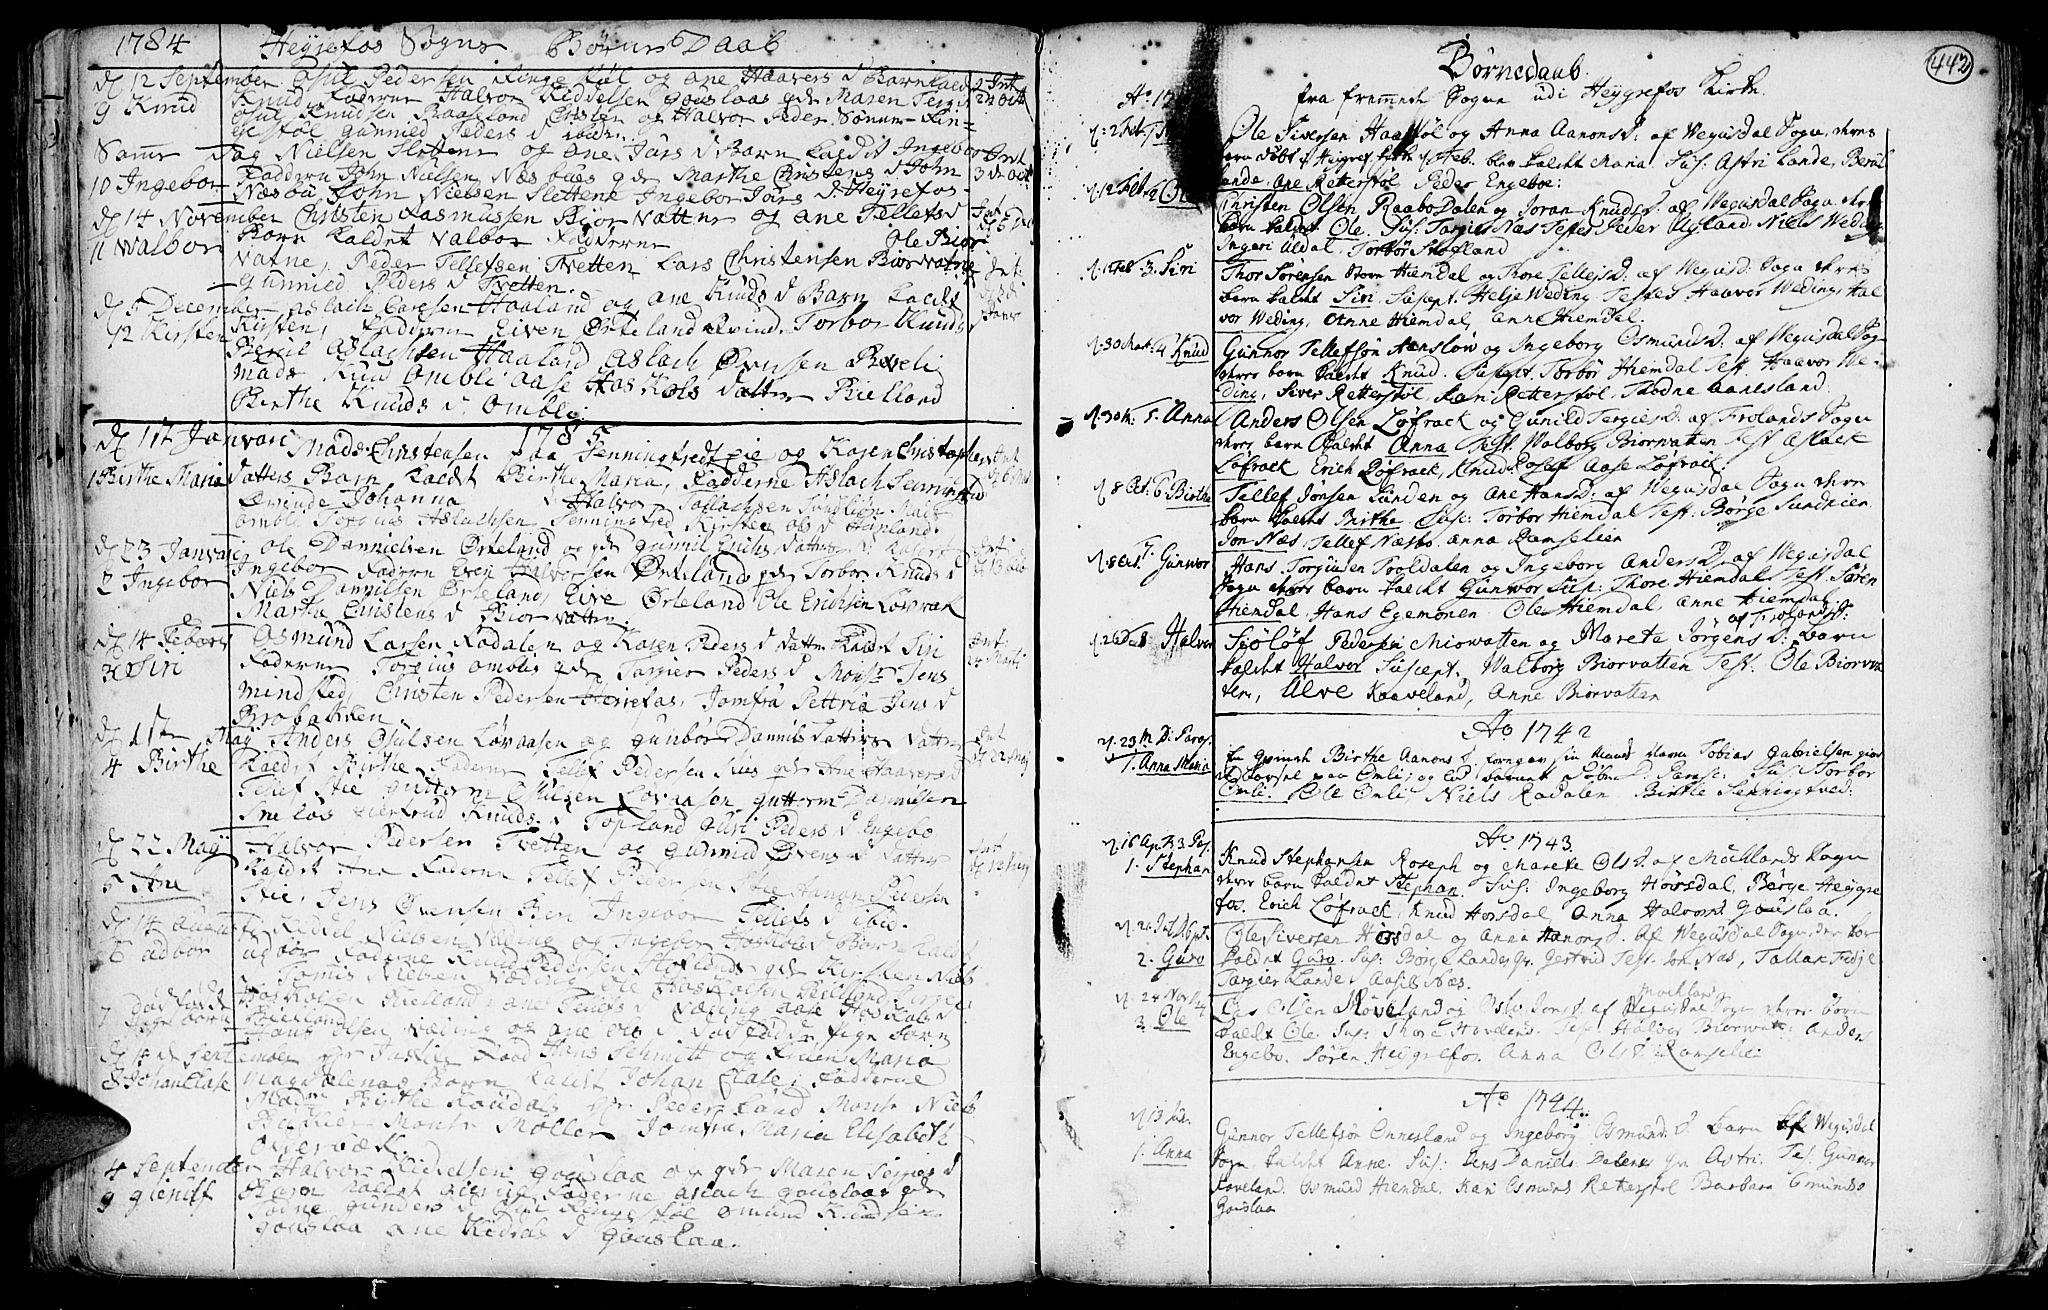 SAK, Hommedal sokneprestkontor, F/Fa/Fab/L0002: Ministerialbok nr. A 2 /3, 1740-1821, s. 442